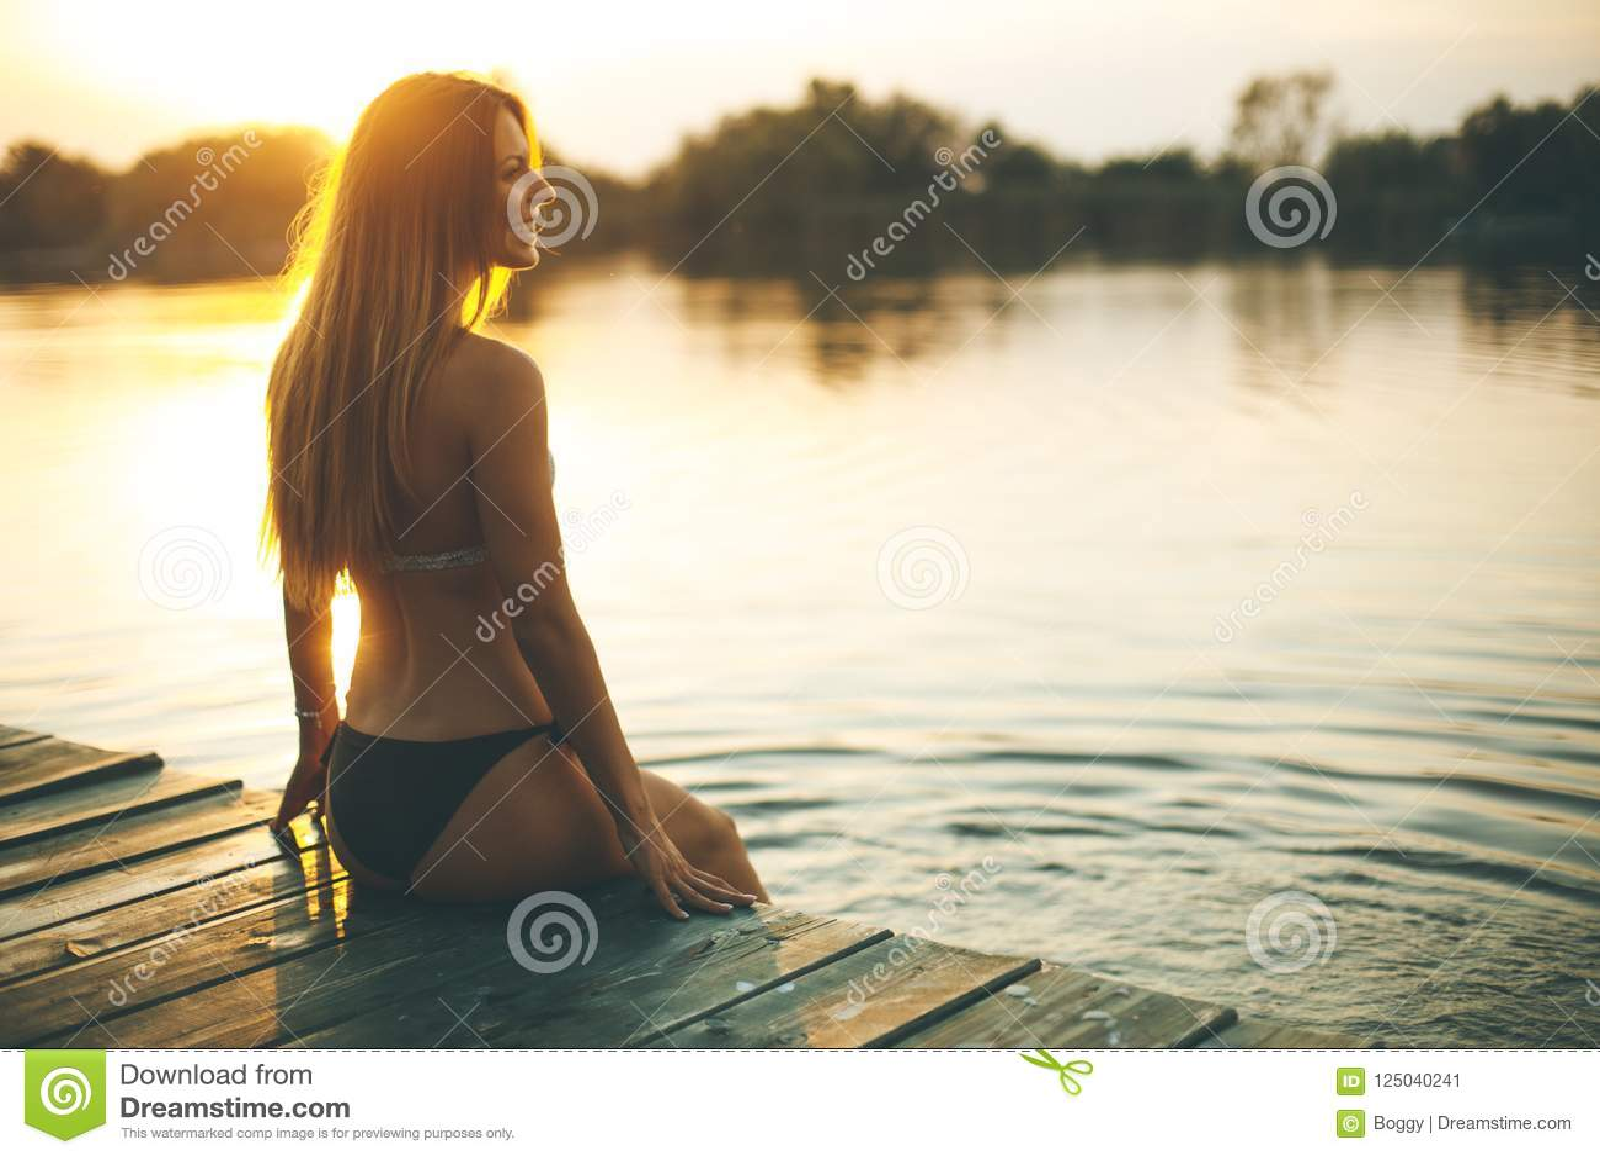 Молодая женщина в бикини на пристани рекой